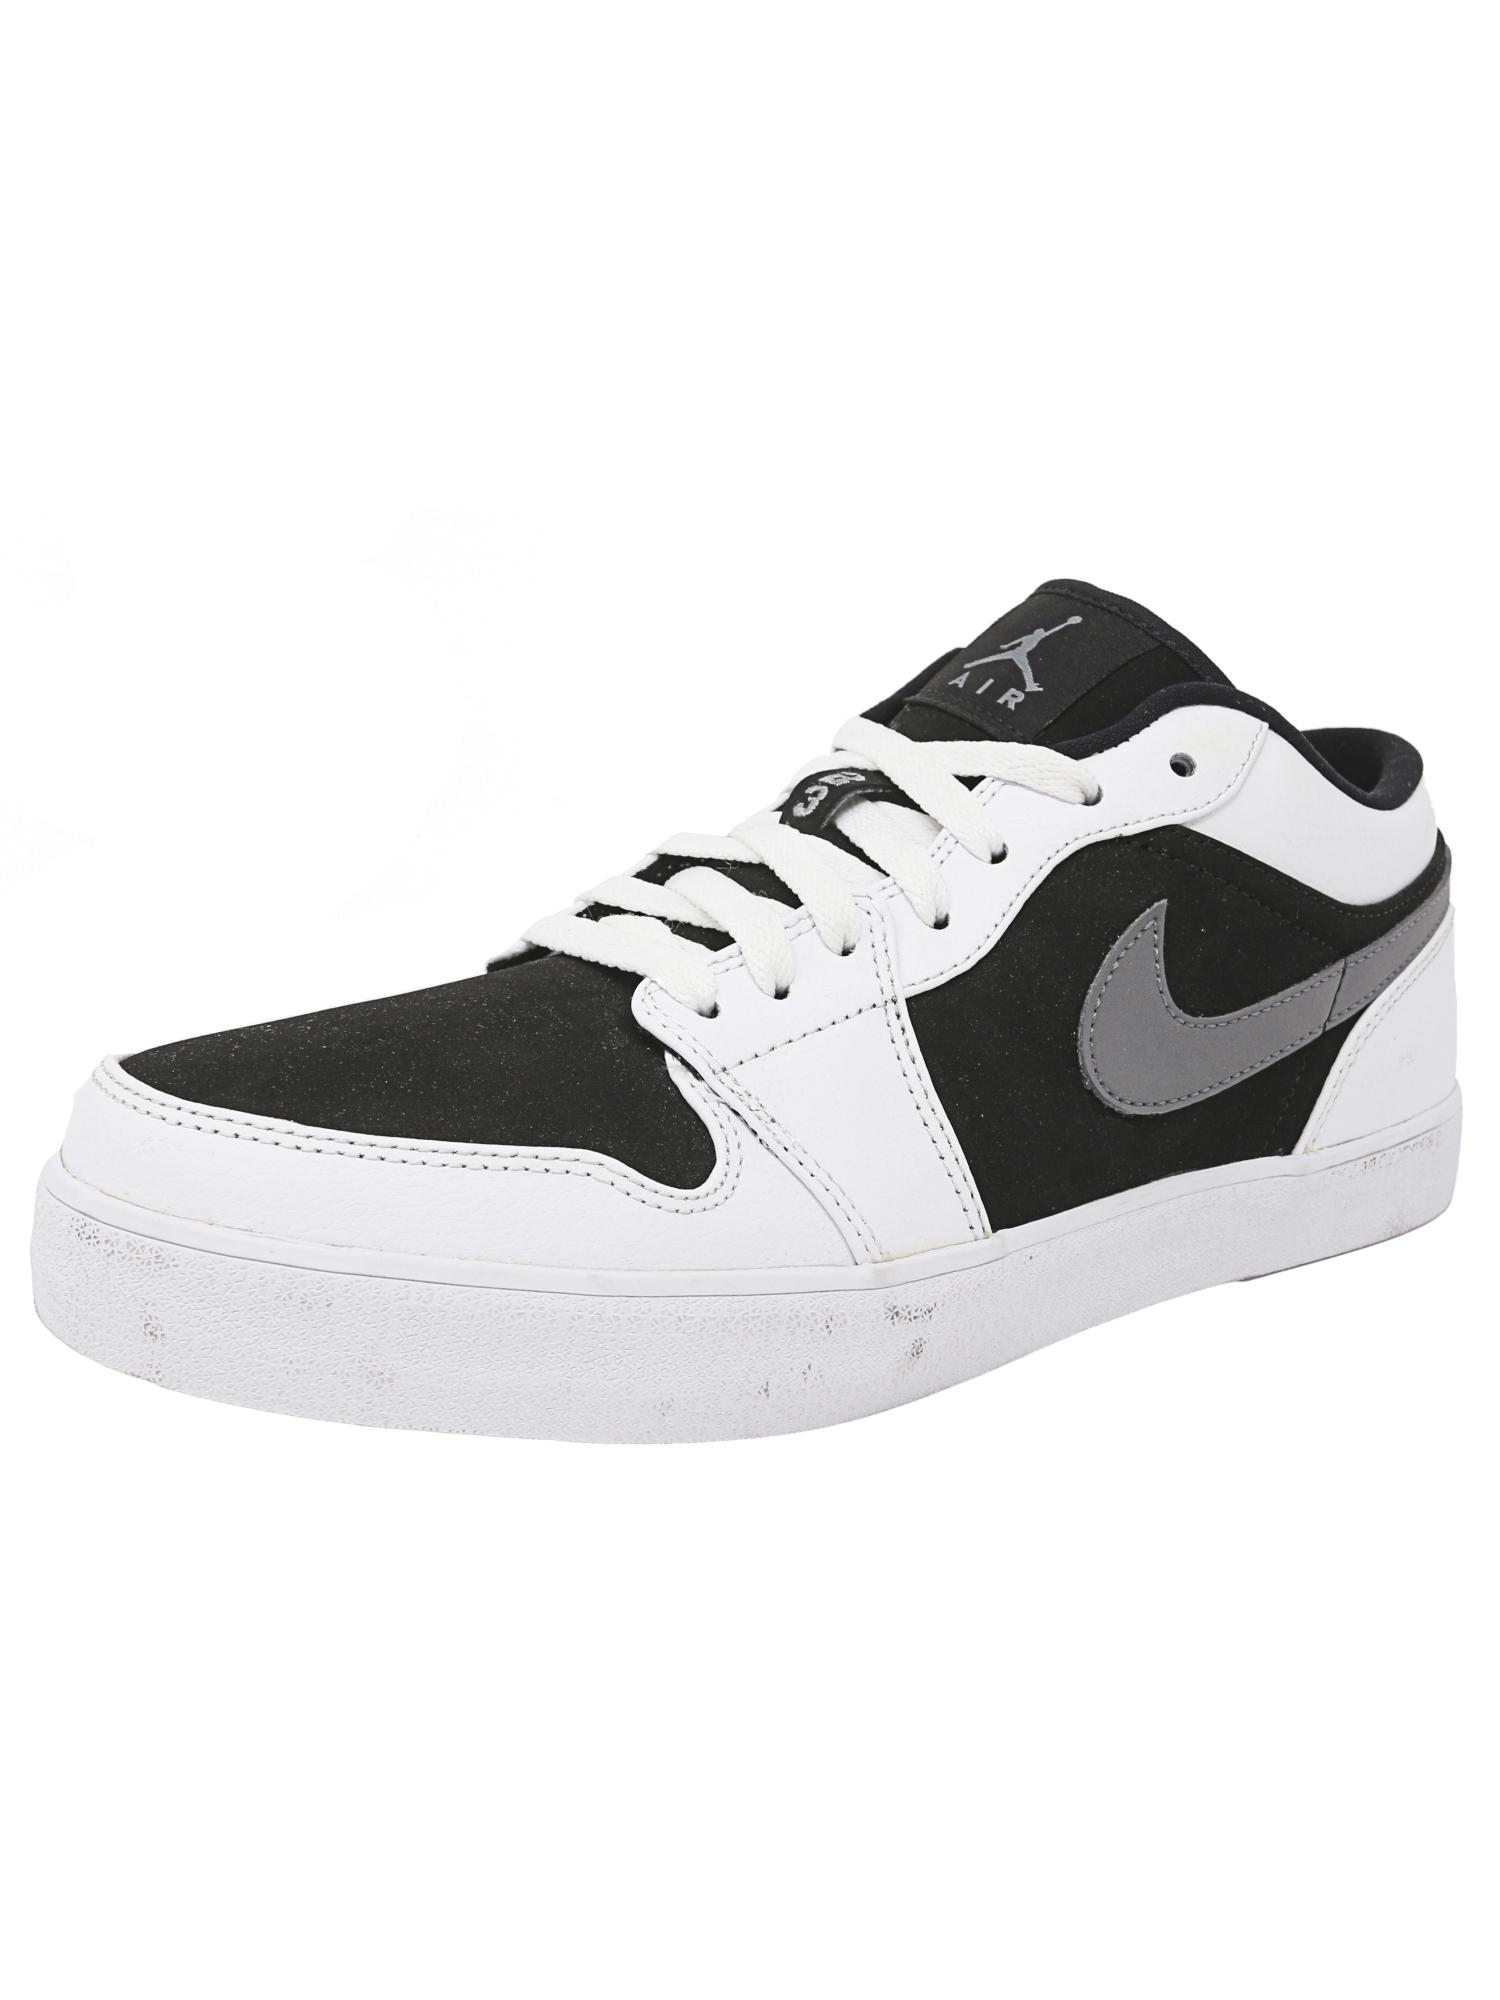 Nike männer 5523ankle 5523ankle 5523ankle hohen basketball - schuh 17d639